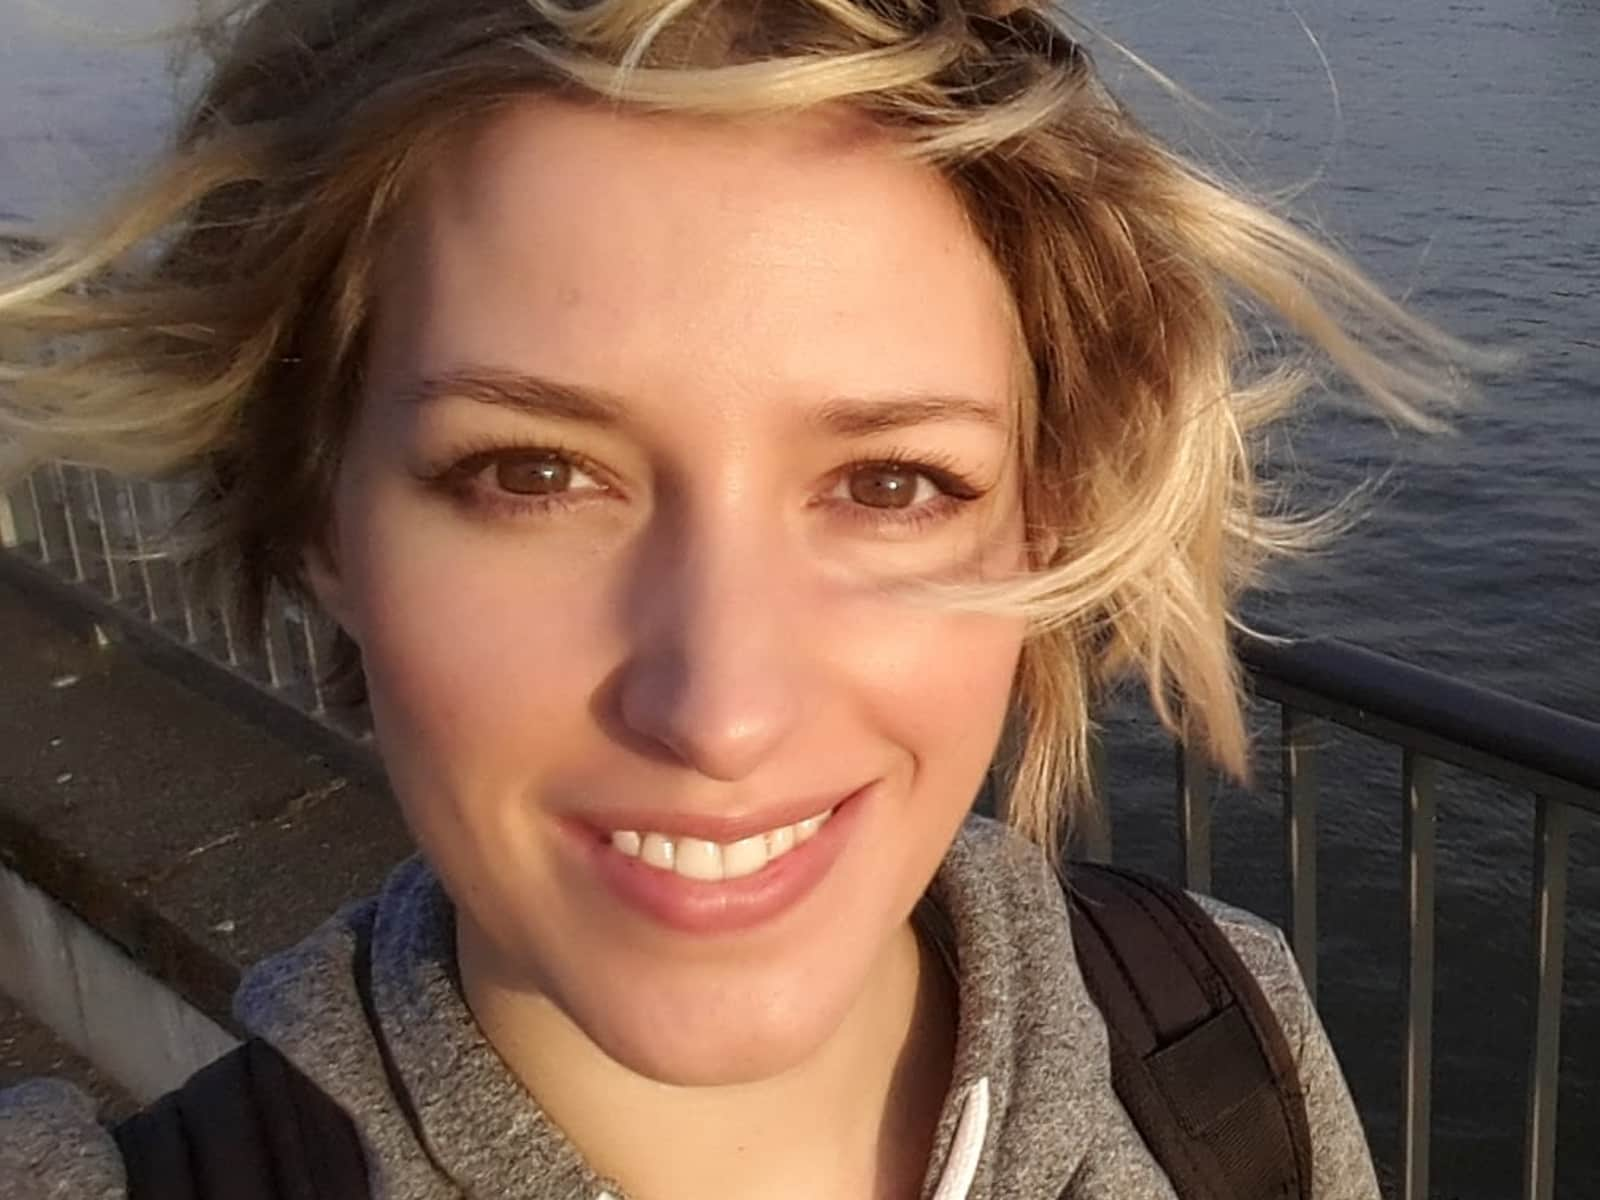 Britta from Hamburg, Germany